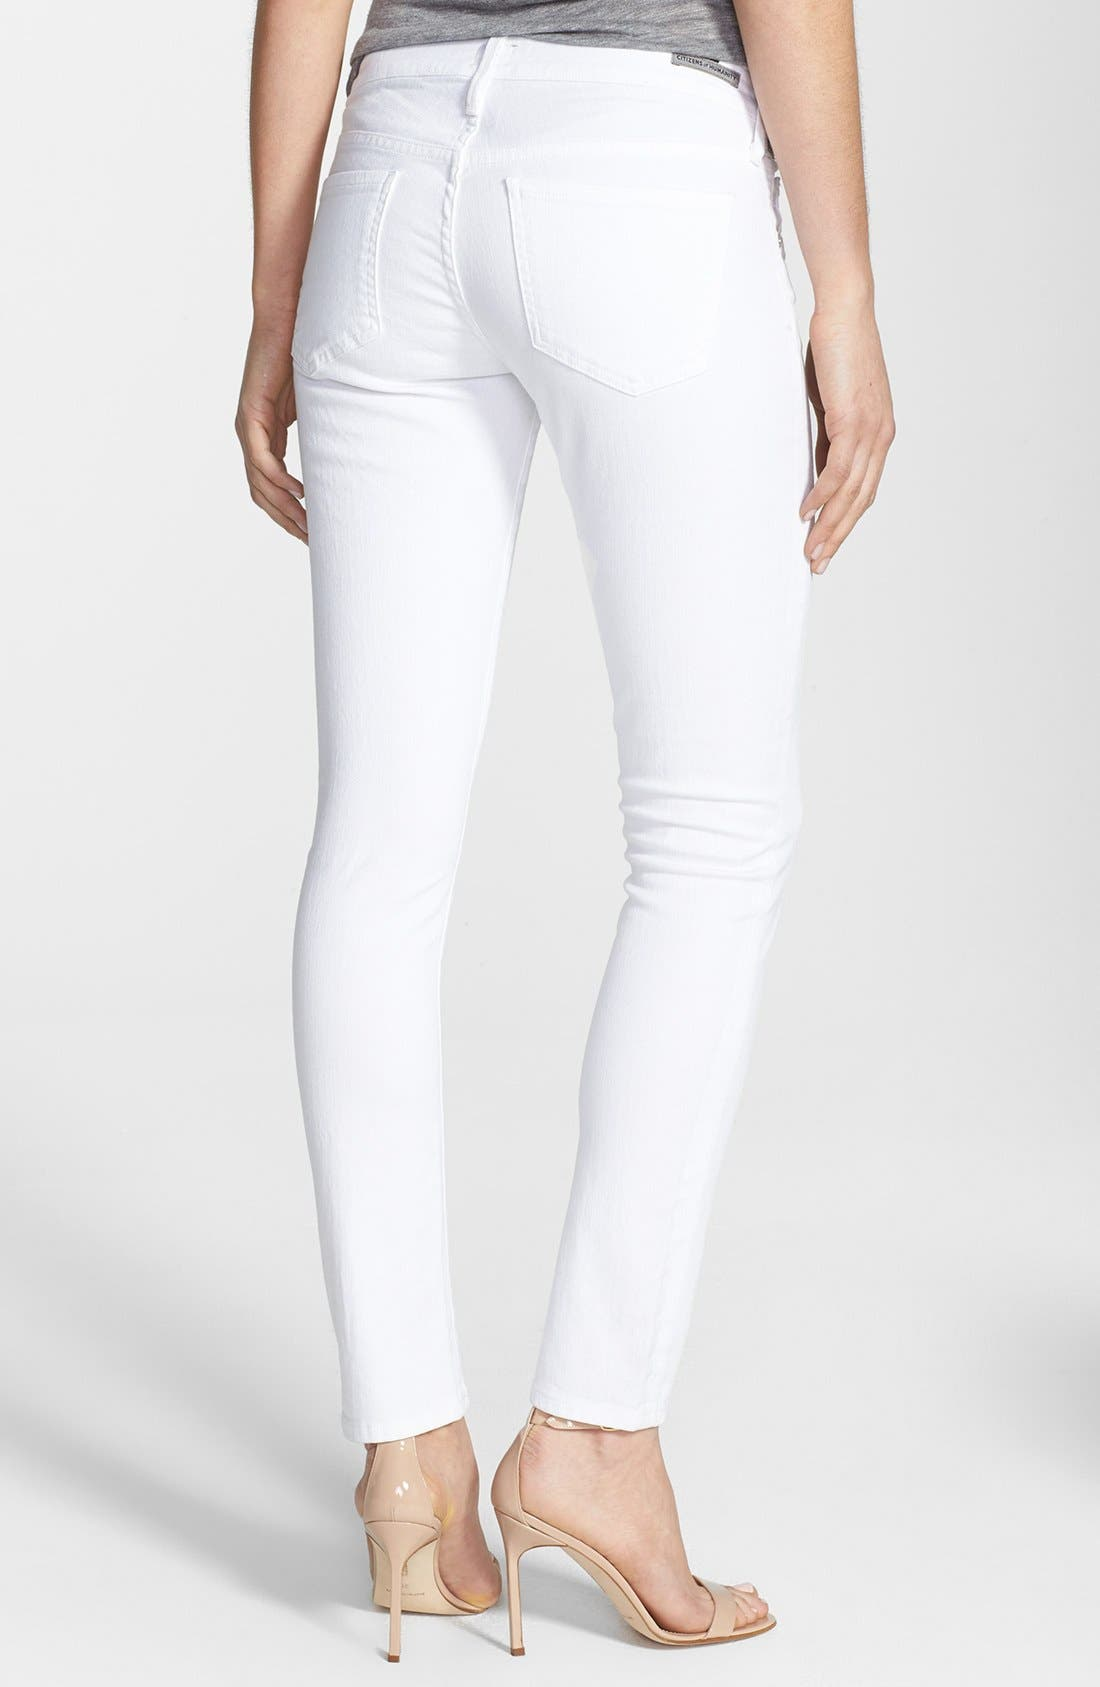 Alternate Image 2  - Citizens of Humanity 'Racer' Low Rise Skinny Jeans (Santorini White)